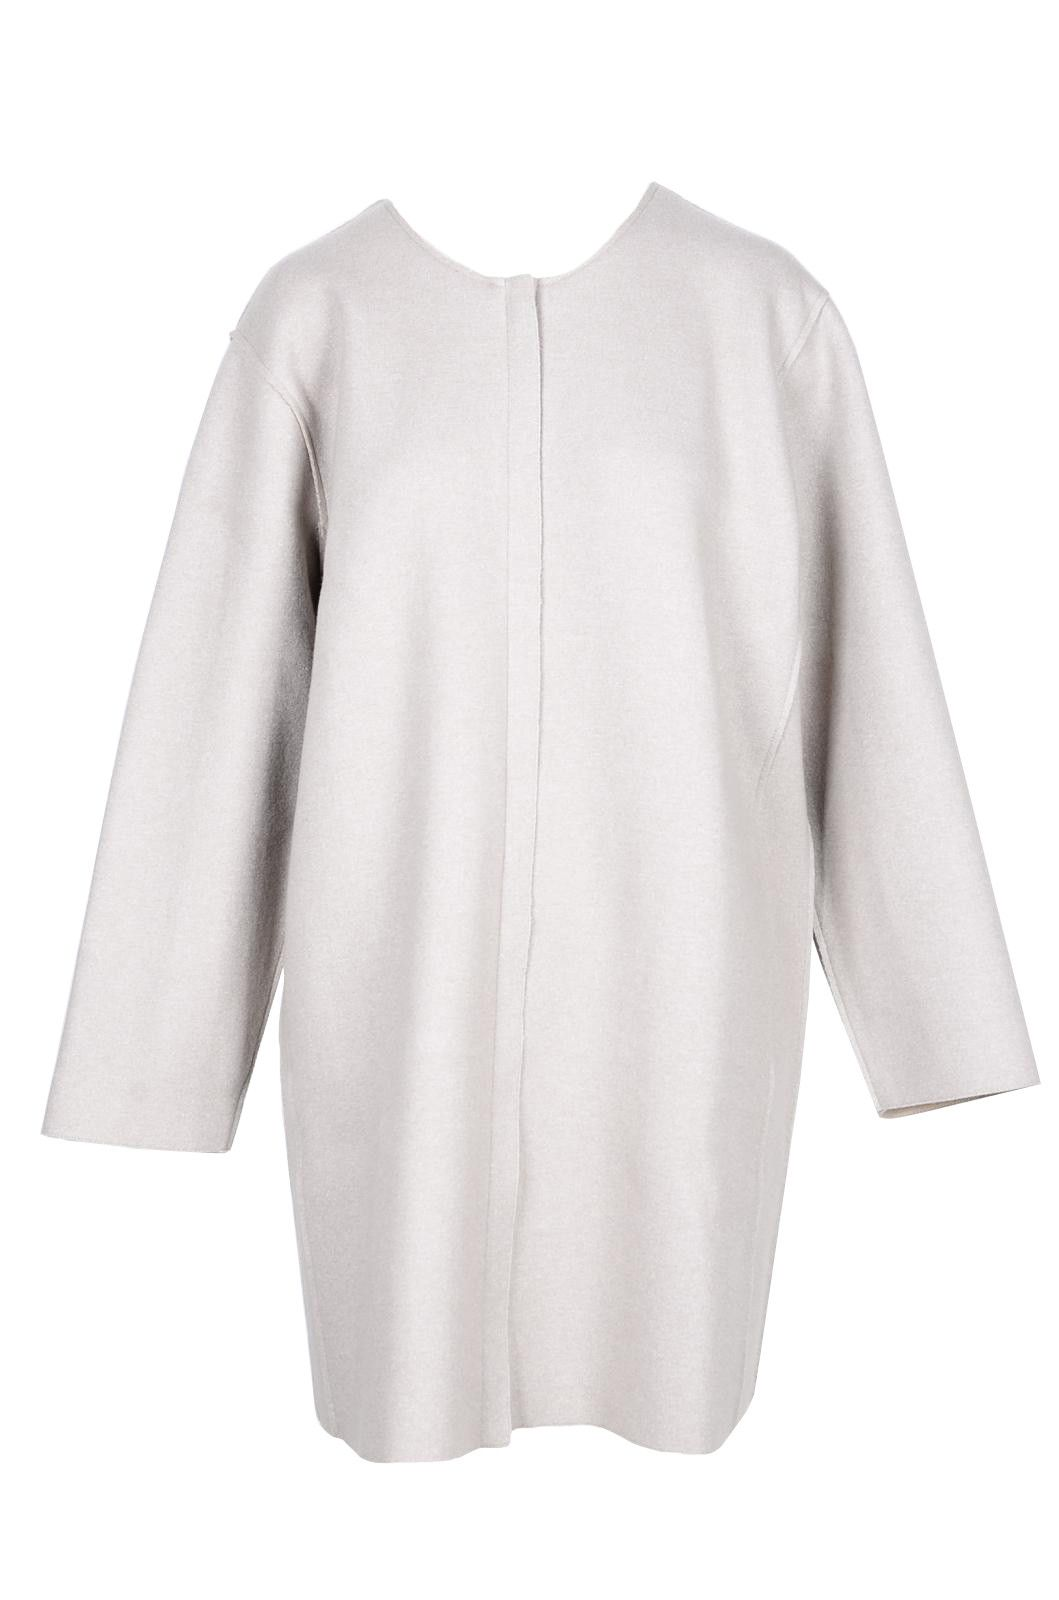 Lamberto Losani Women's Coat In Beige